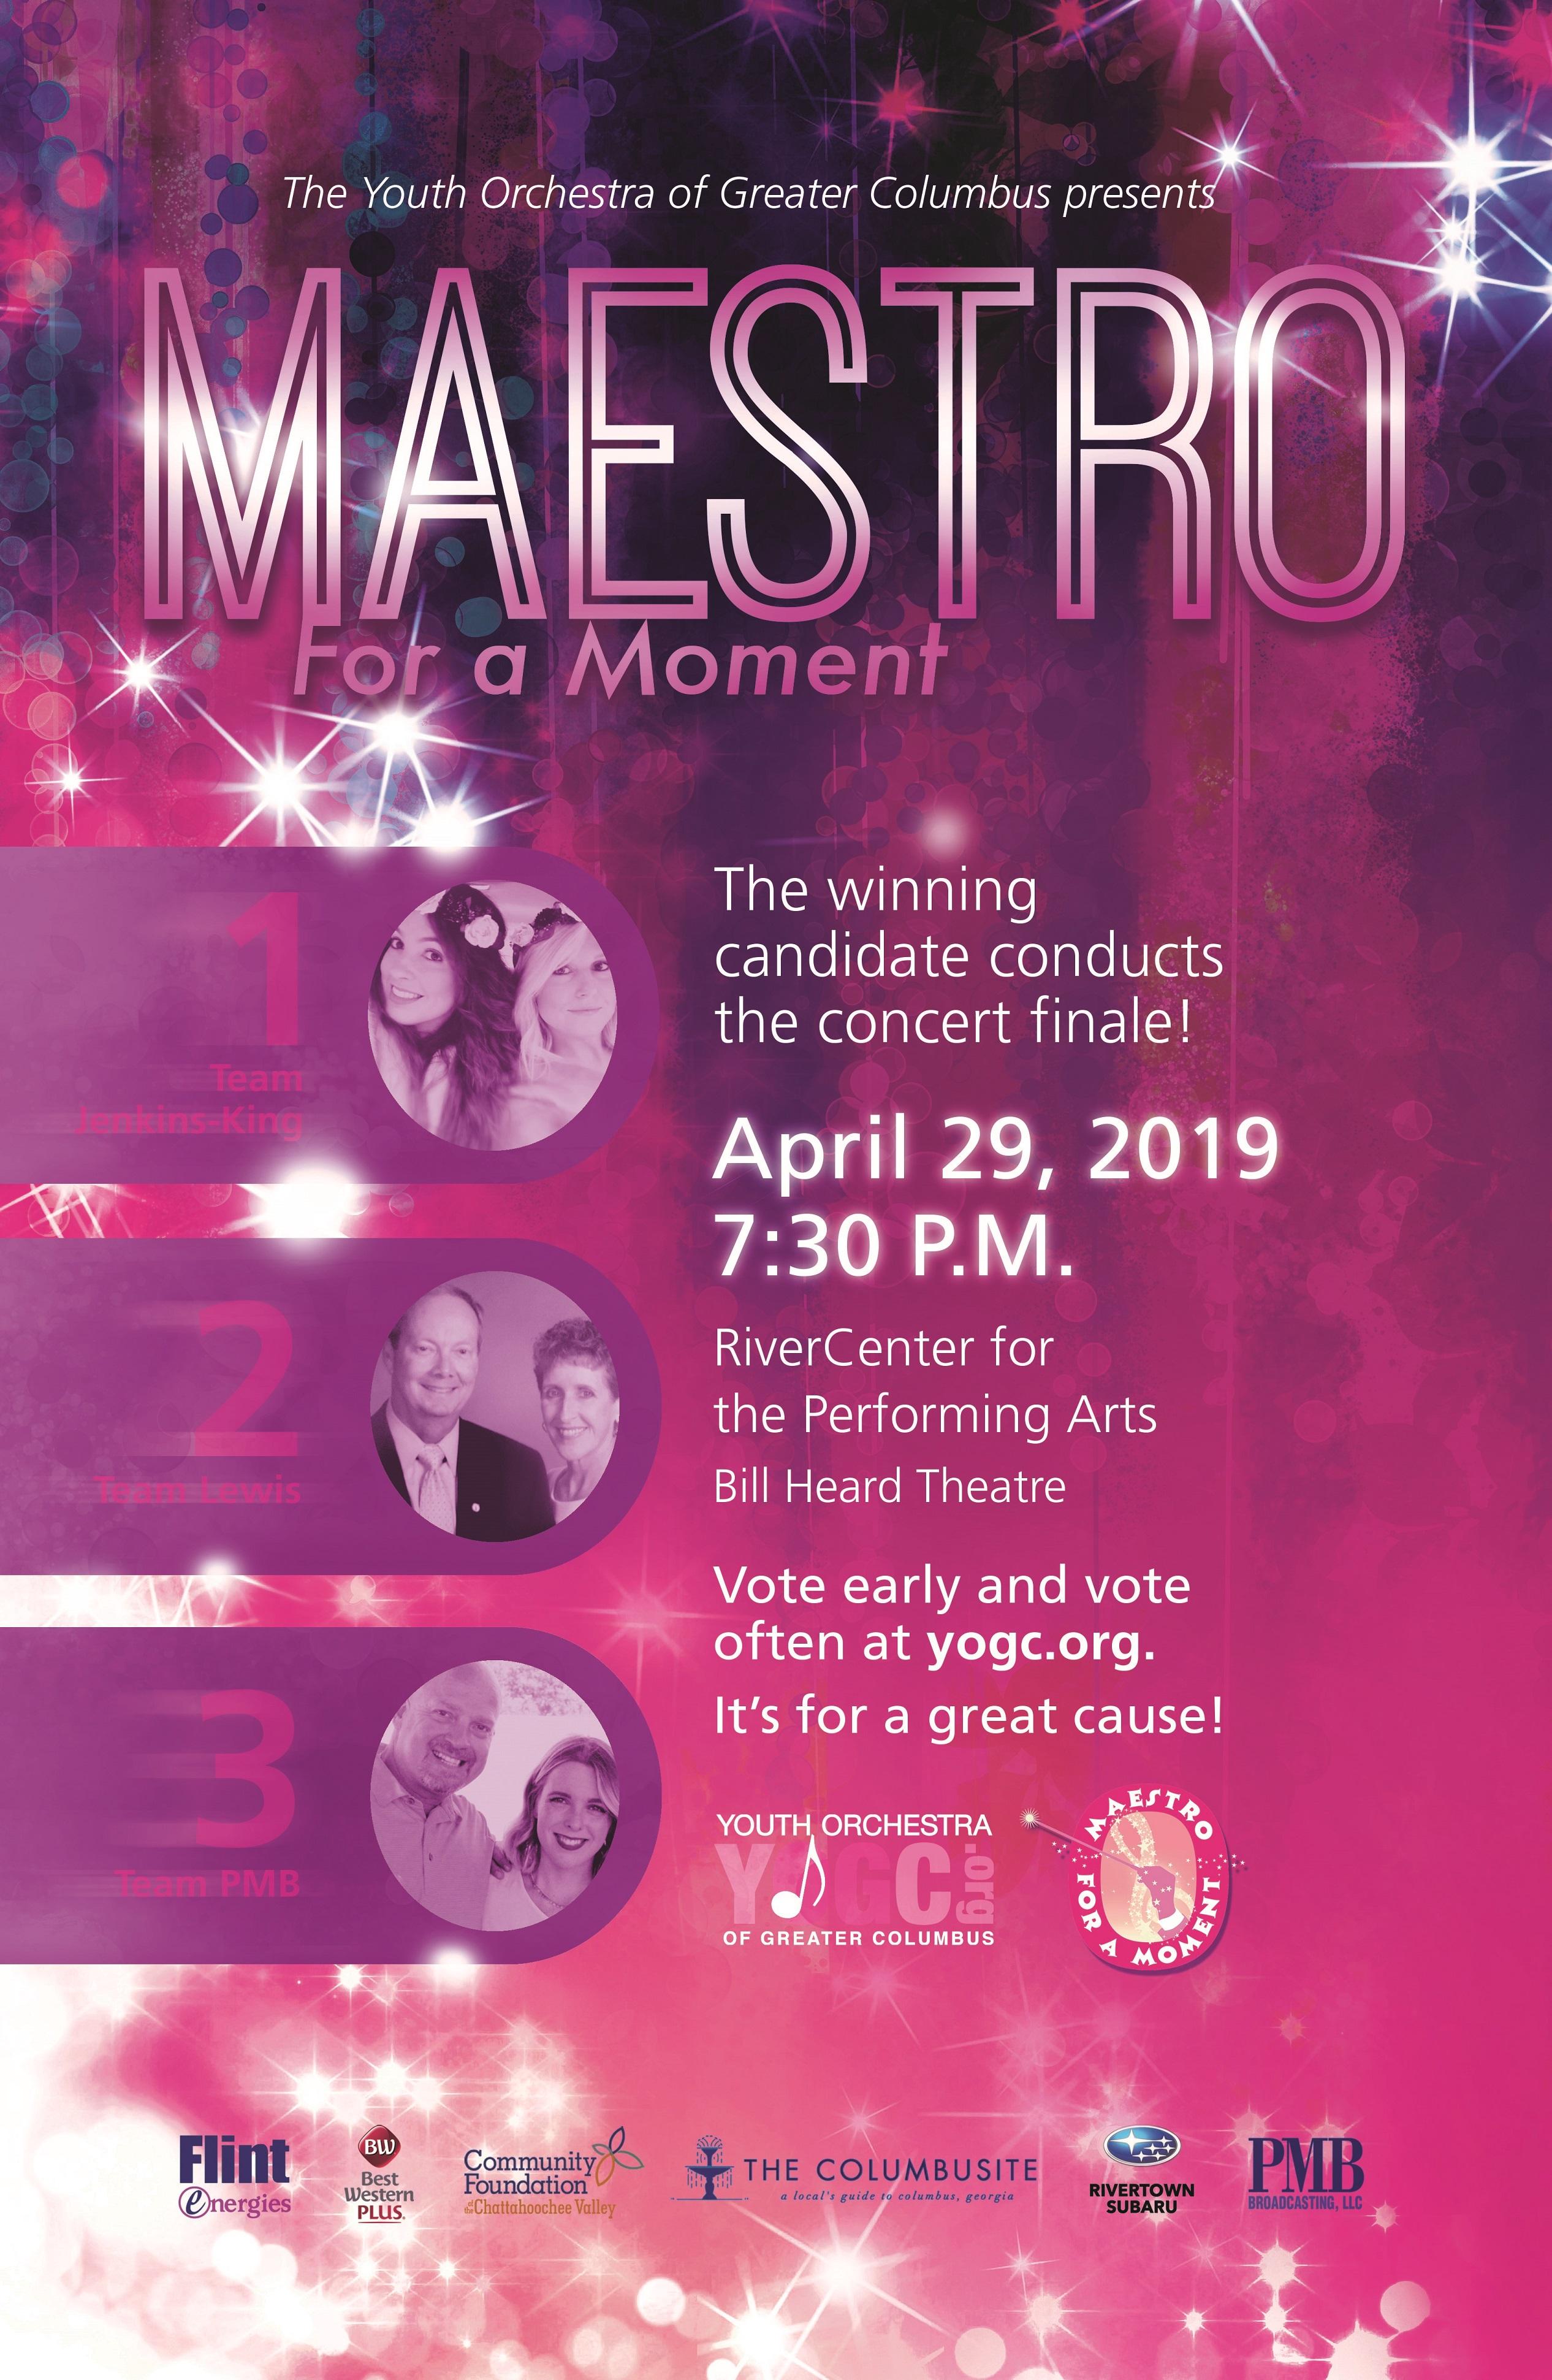 YOGC Maestro for a Moment Concert